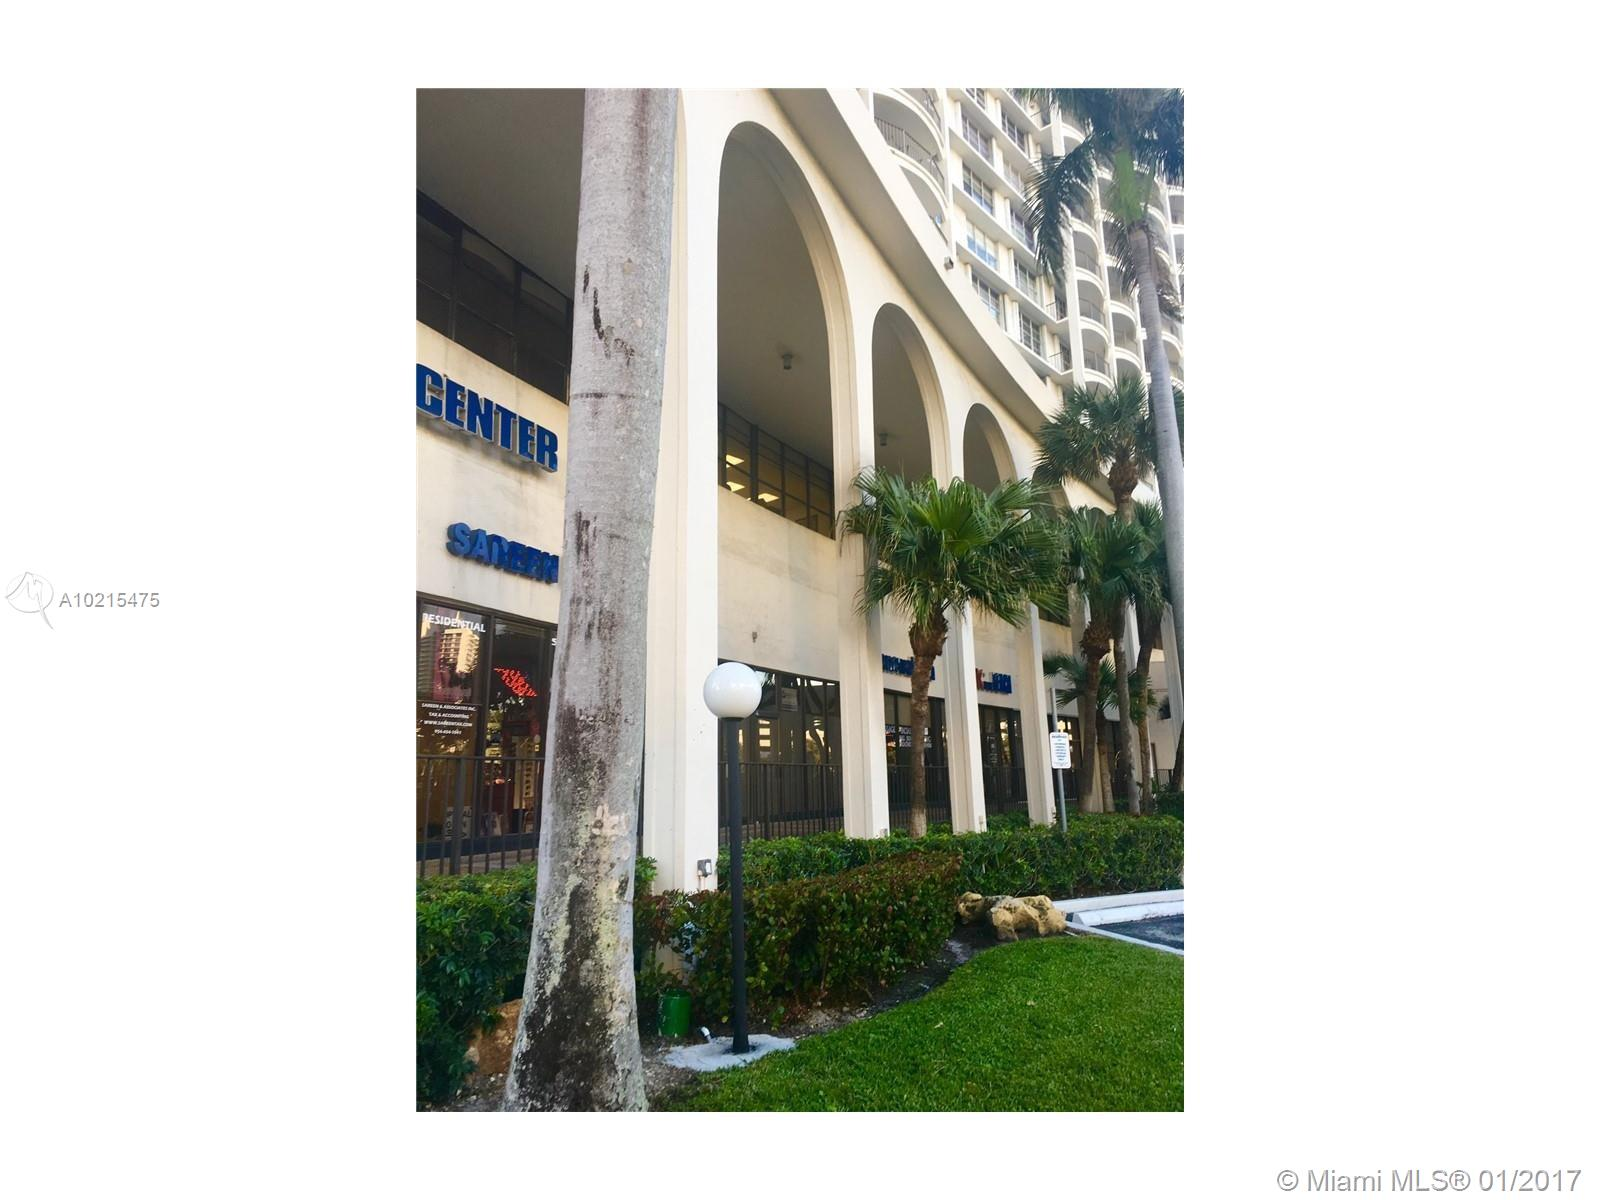 Hallmark of Hollywood - 3800 S Ocean Dr RETAIL, Hollywood, FL 33019